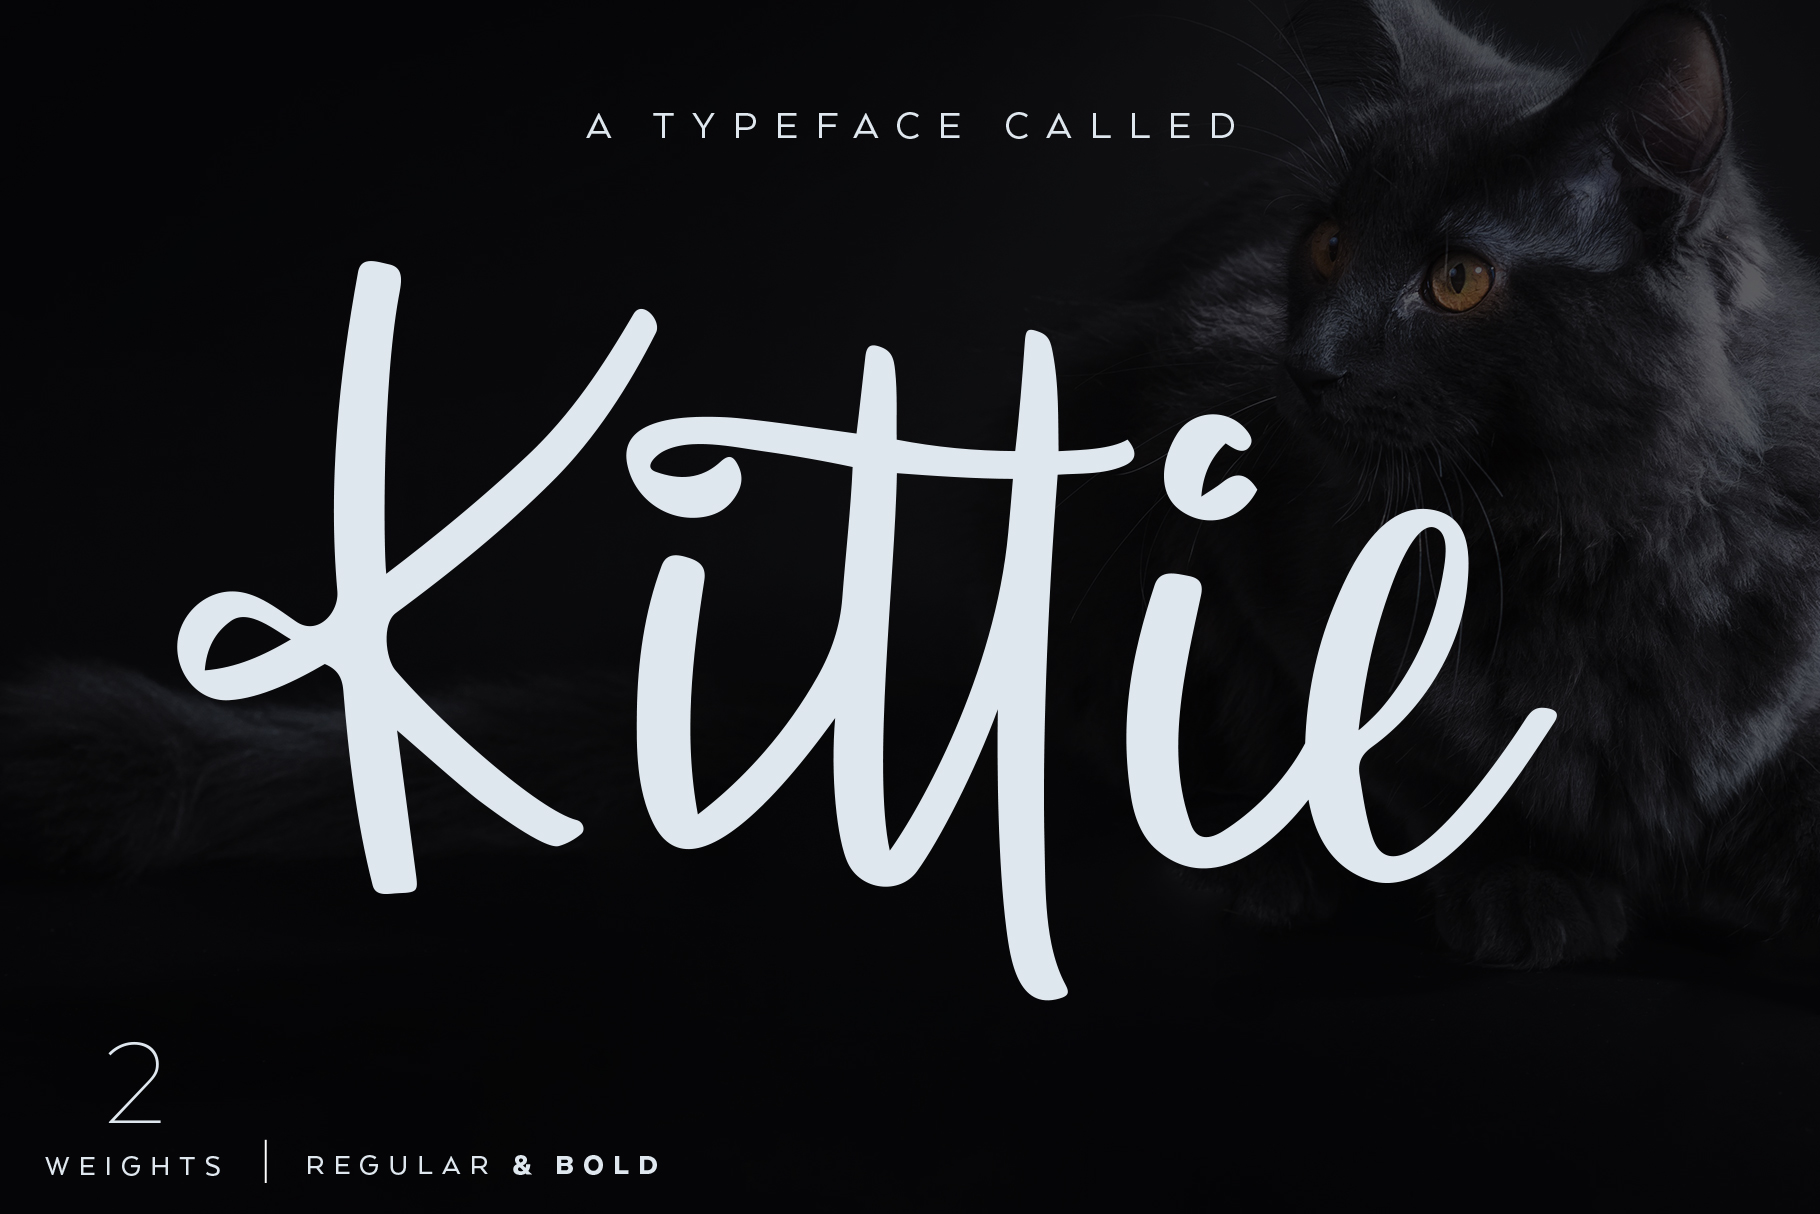 Kittie | Regular & Bold example image 1